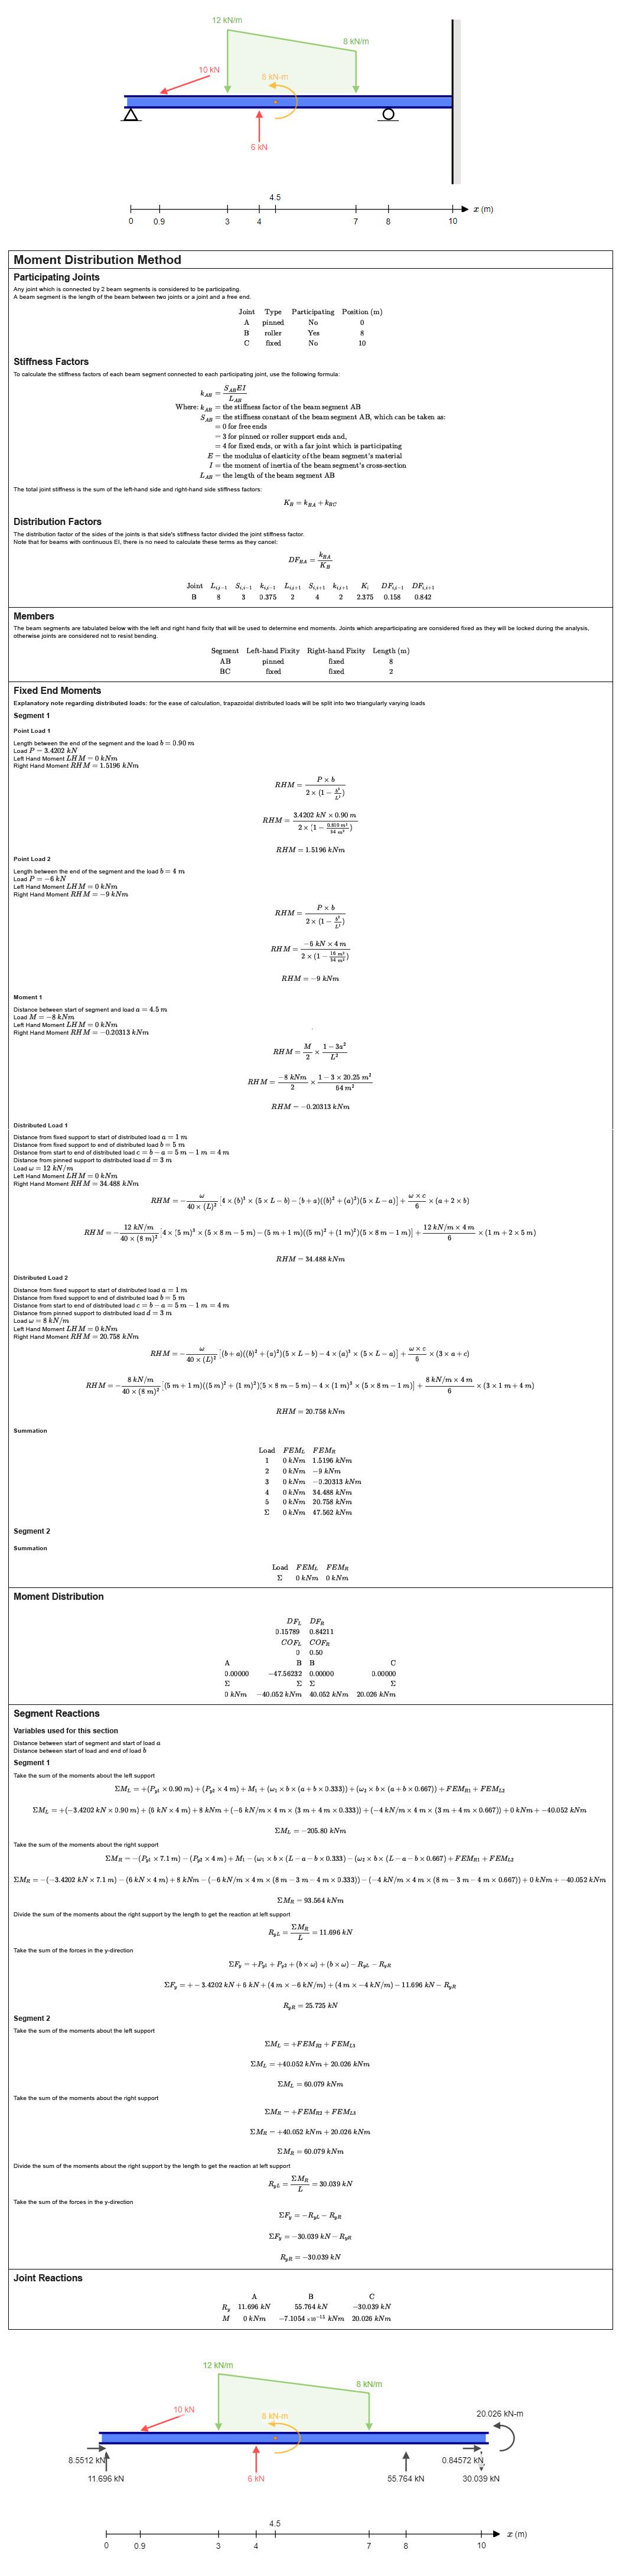 Sample Moment Distribution Method Hand Calculation Report